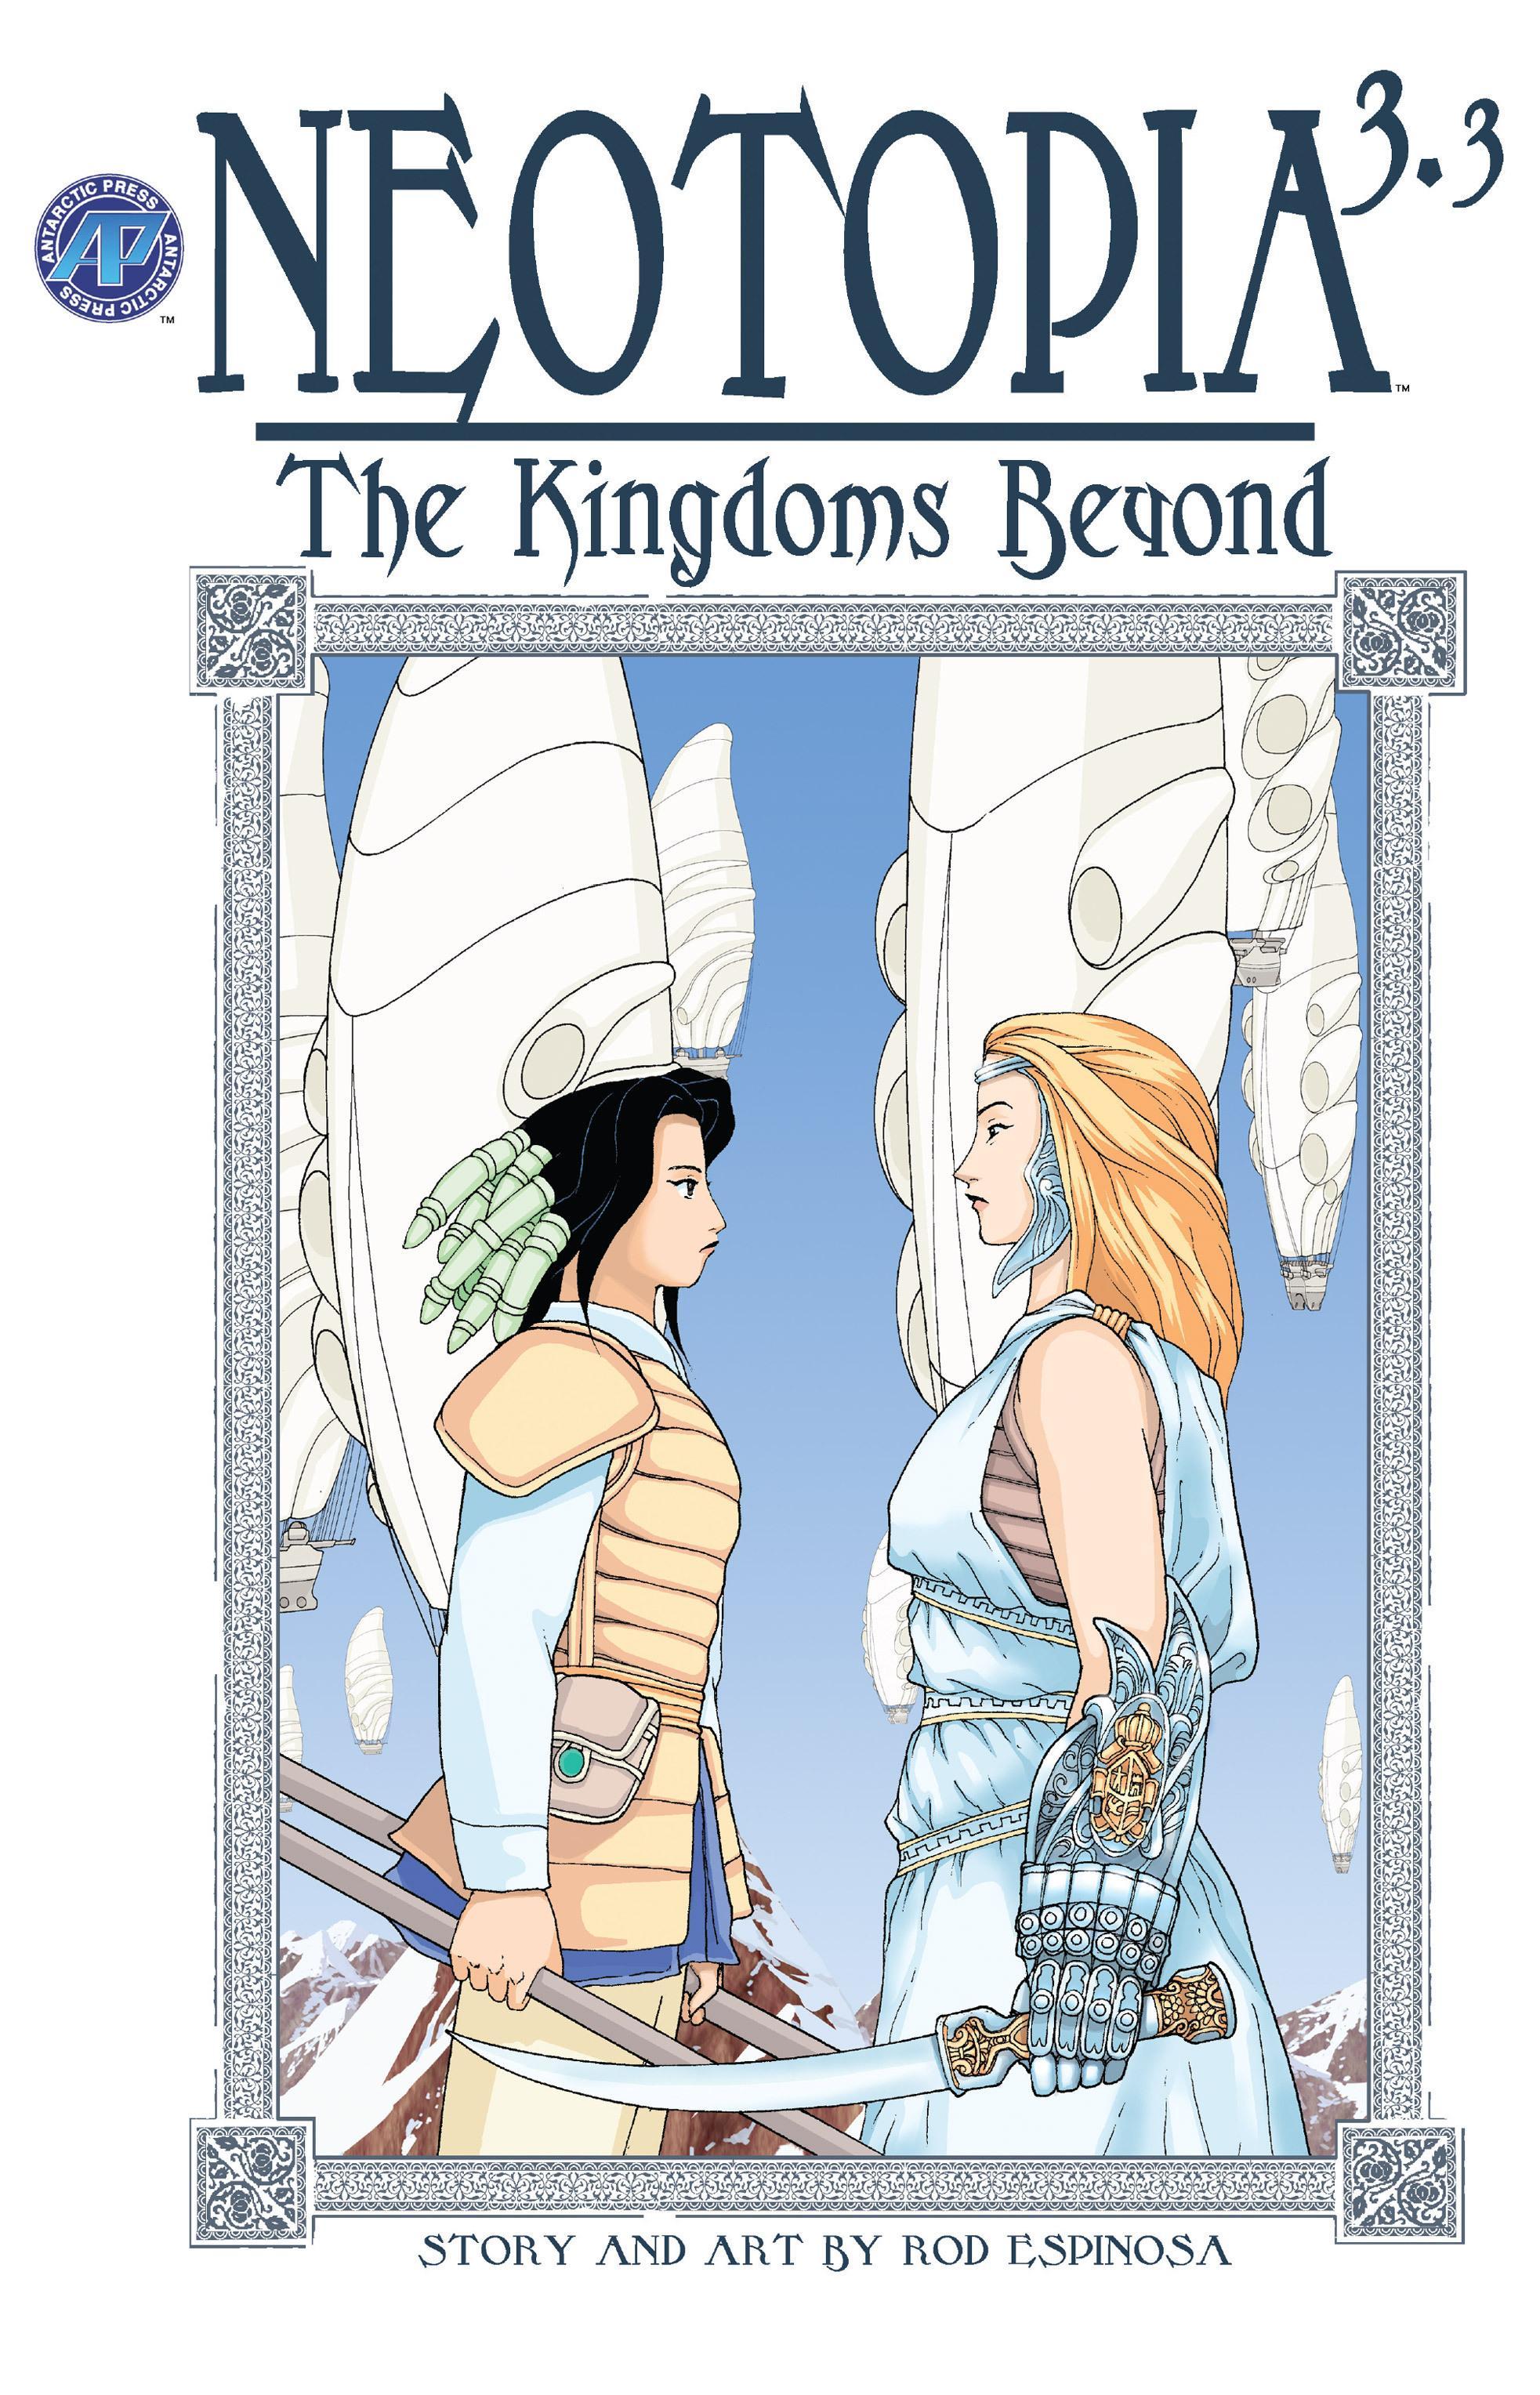 Neotopia v3 The Kingdoms Beyond 001 005 (2004) Neotopia Vol 03 The Kingdoms Beyond 03 (of 05) (2004) (digital) (Minutemen Anni